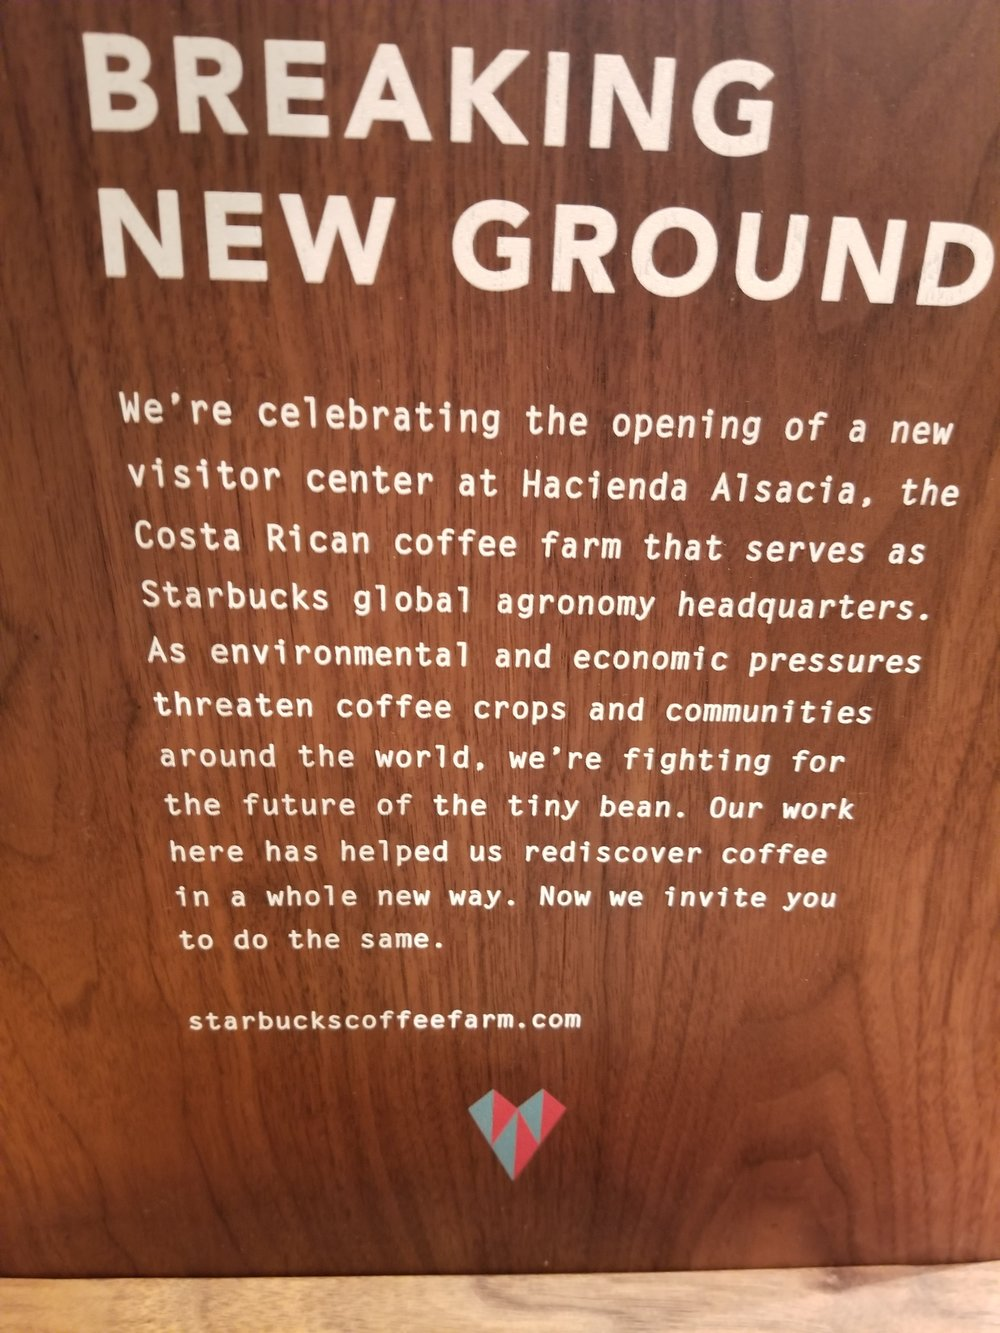 2018 March 7 Costa Rica Hacienda Alsacia opens.jpg